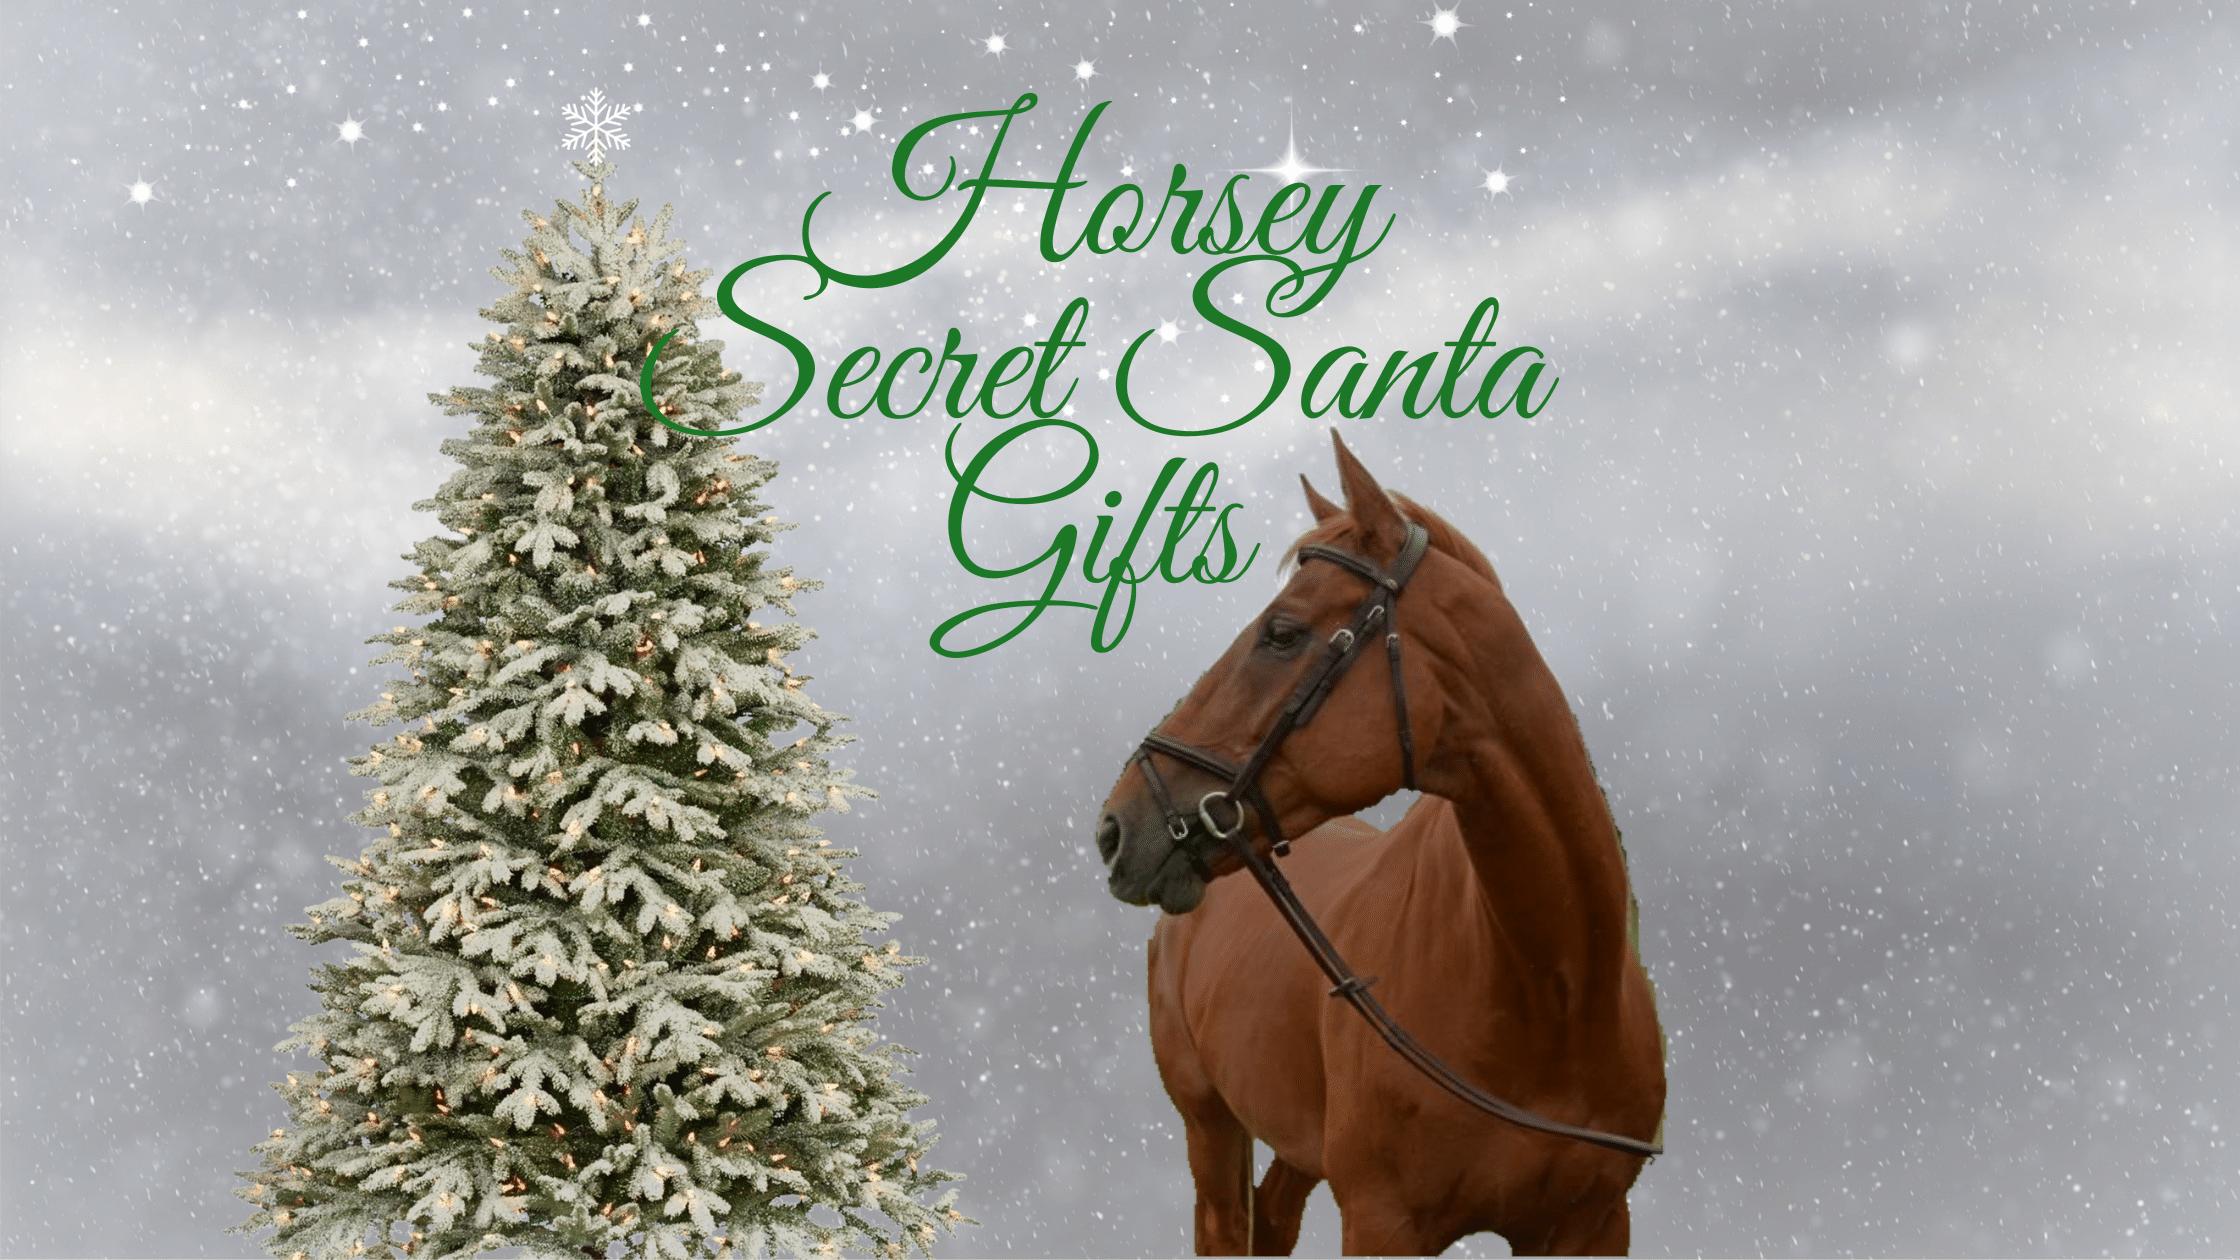 horsey secret santa gifts